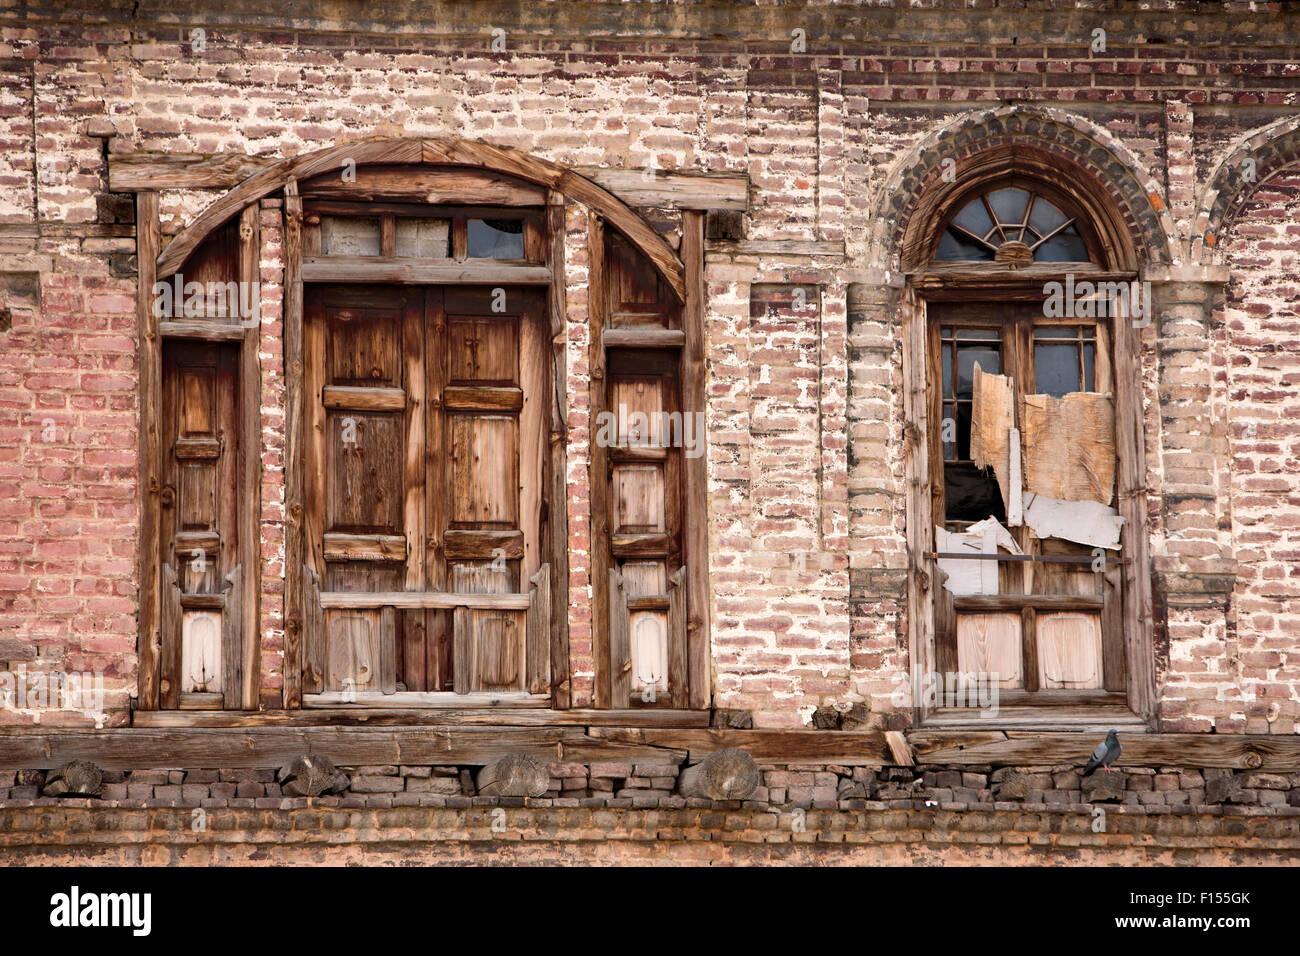 India jammu kashmir srinagar old city wooden windows and shutters of